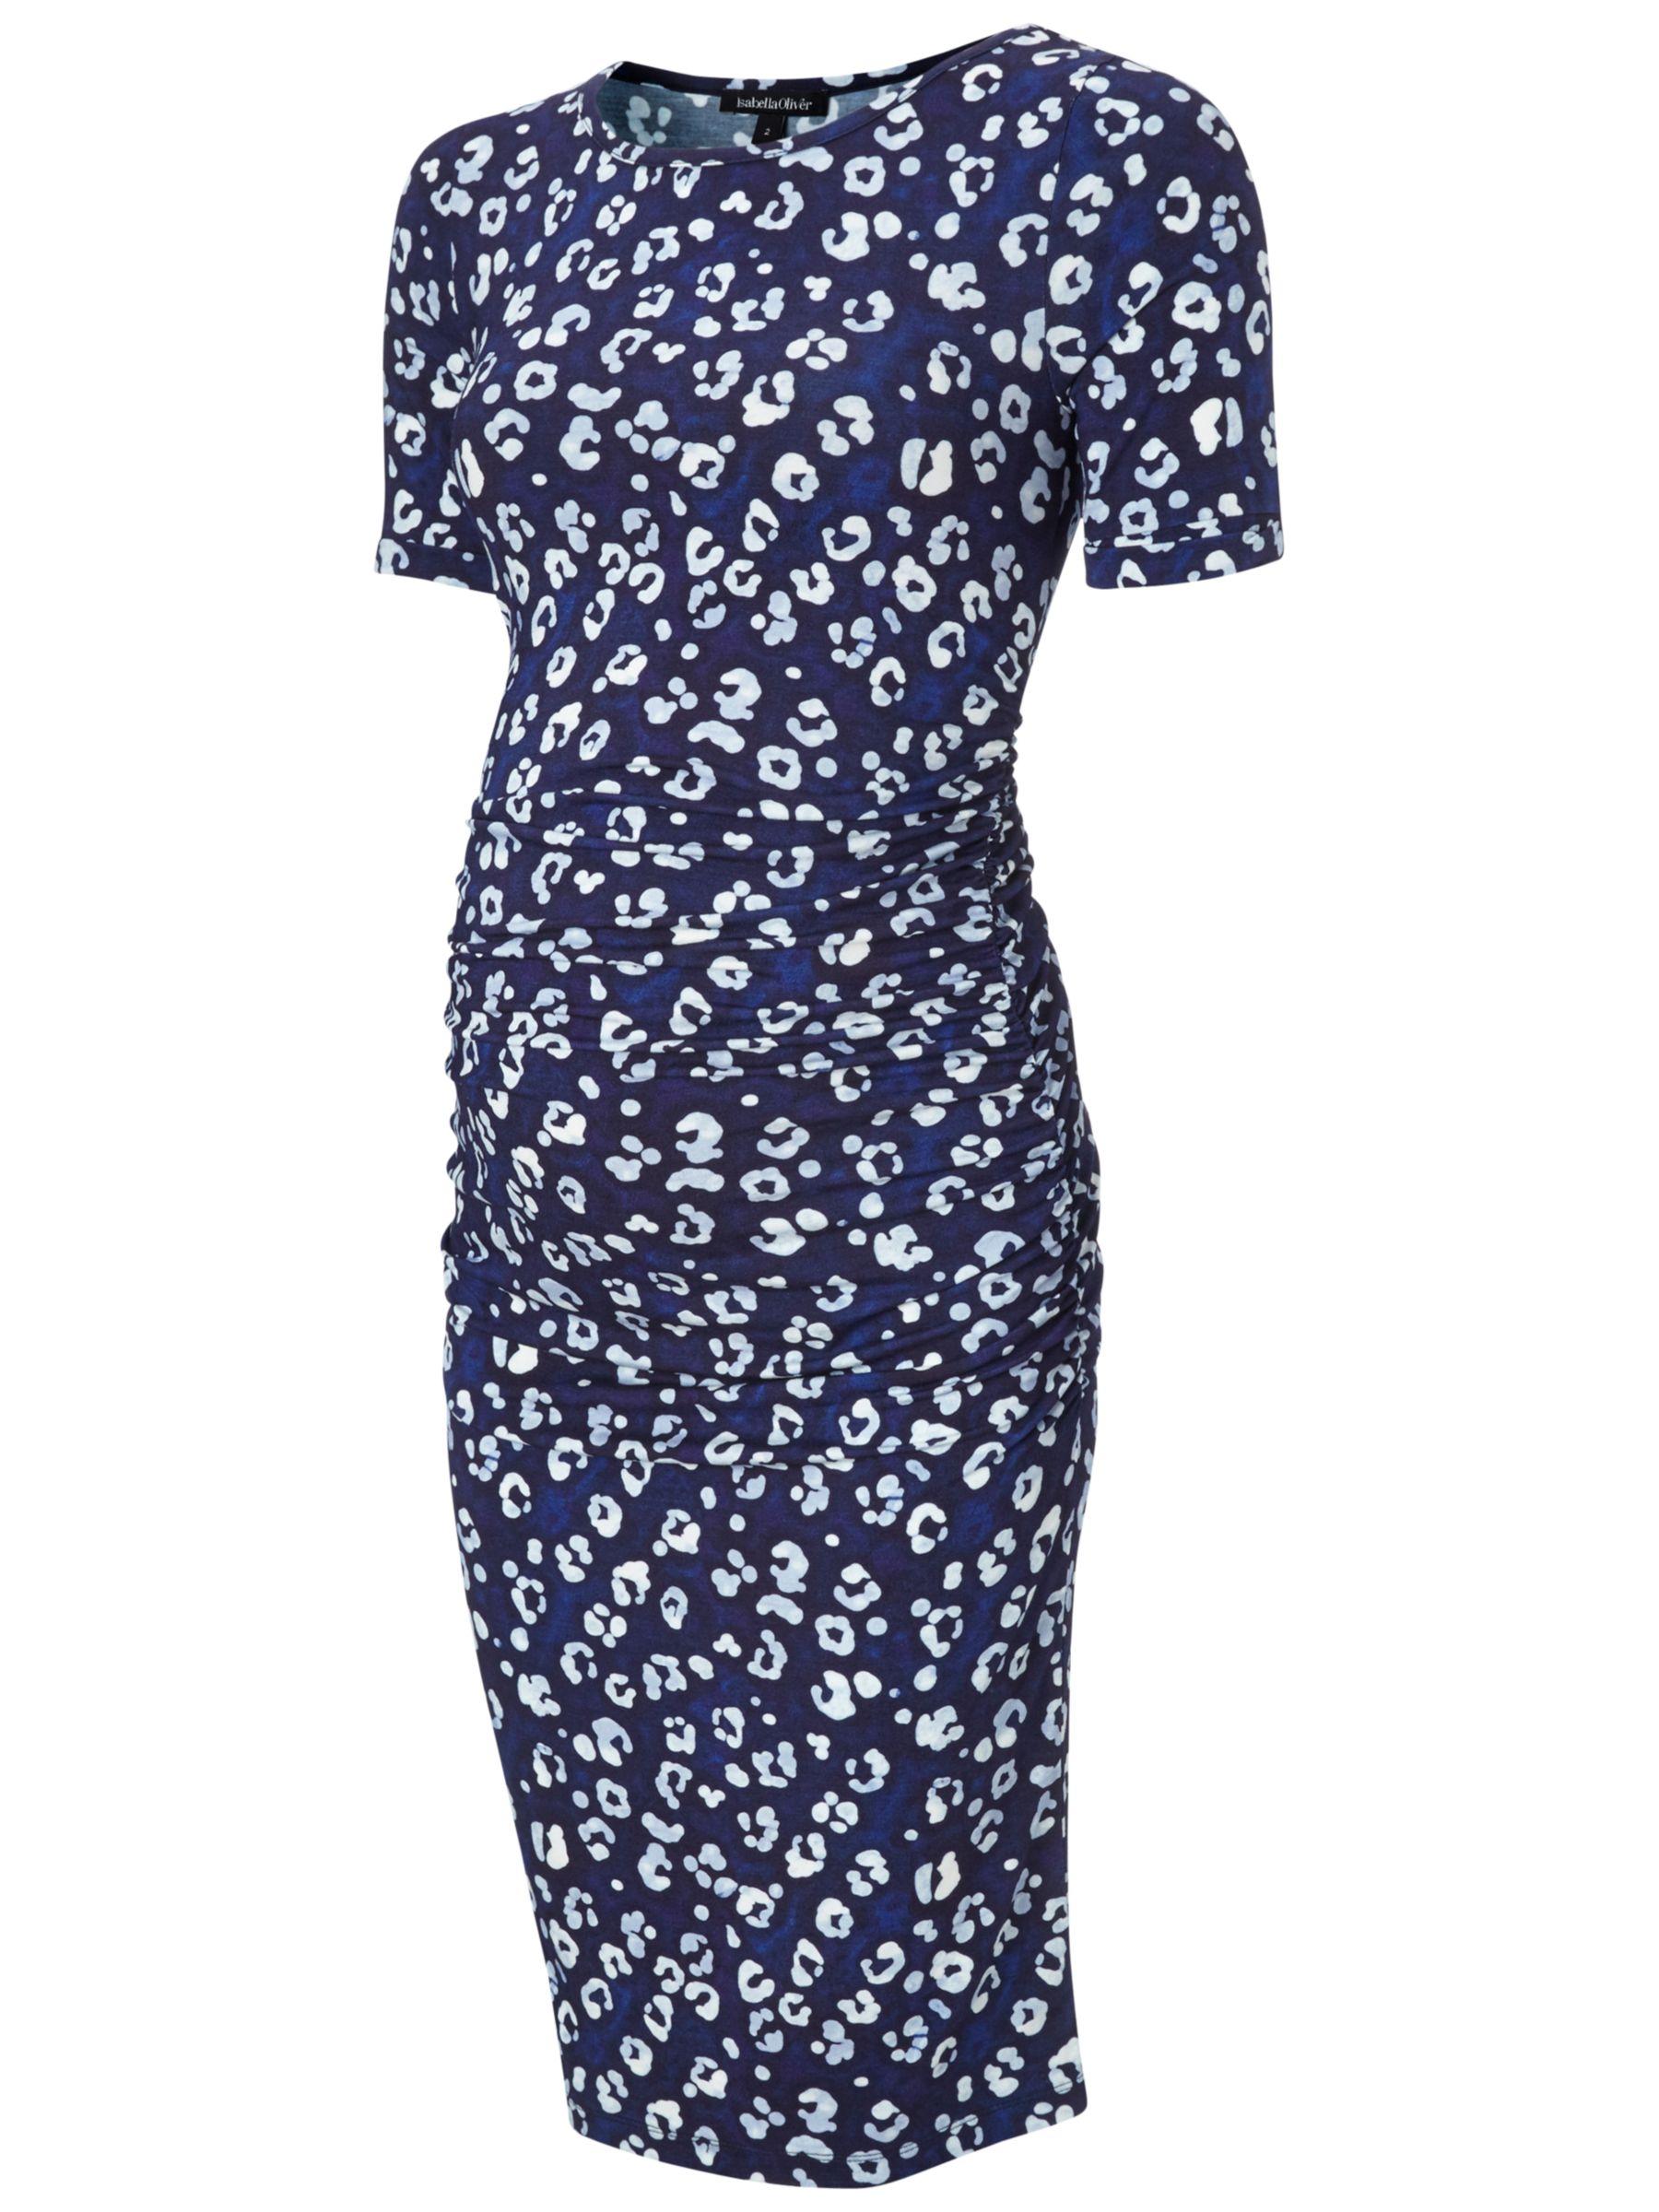 Isabella Oliver Isabella Oliver Robson Print Maternity Dress, Blue/Multi